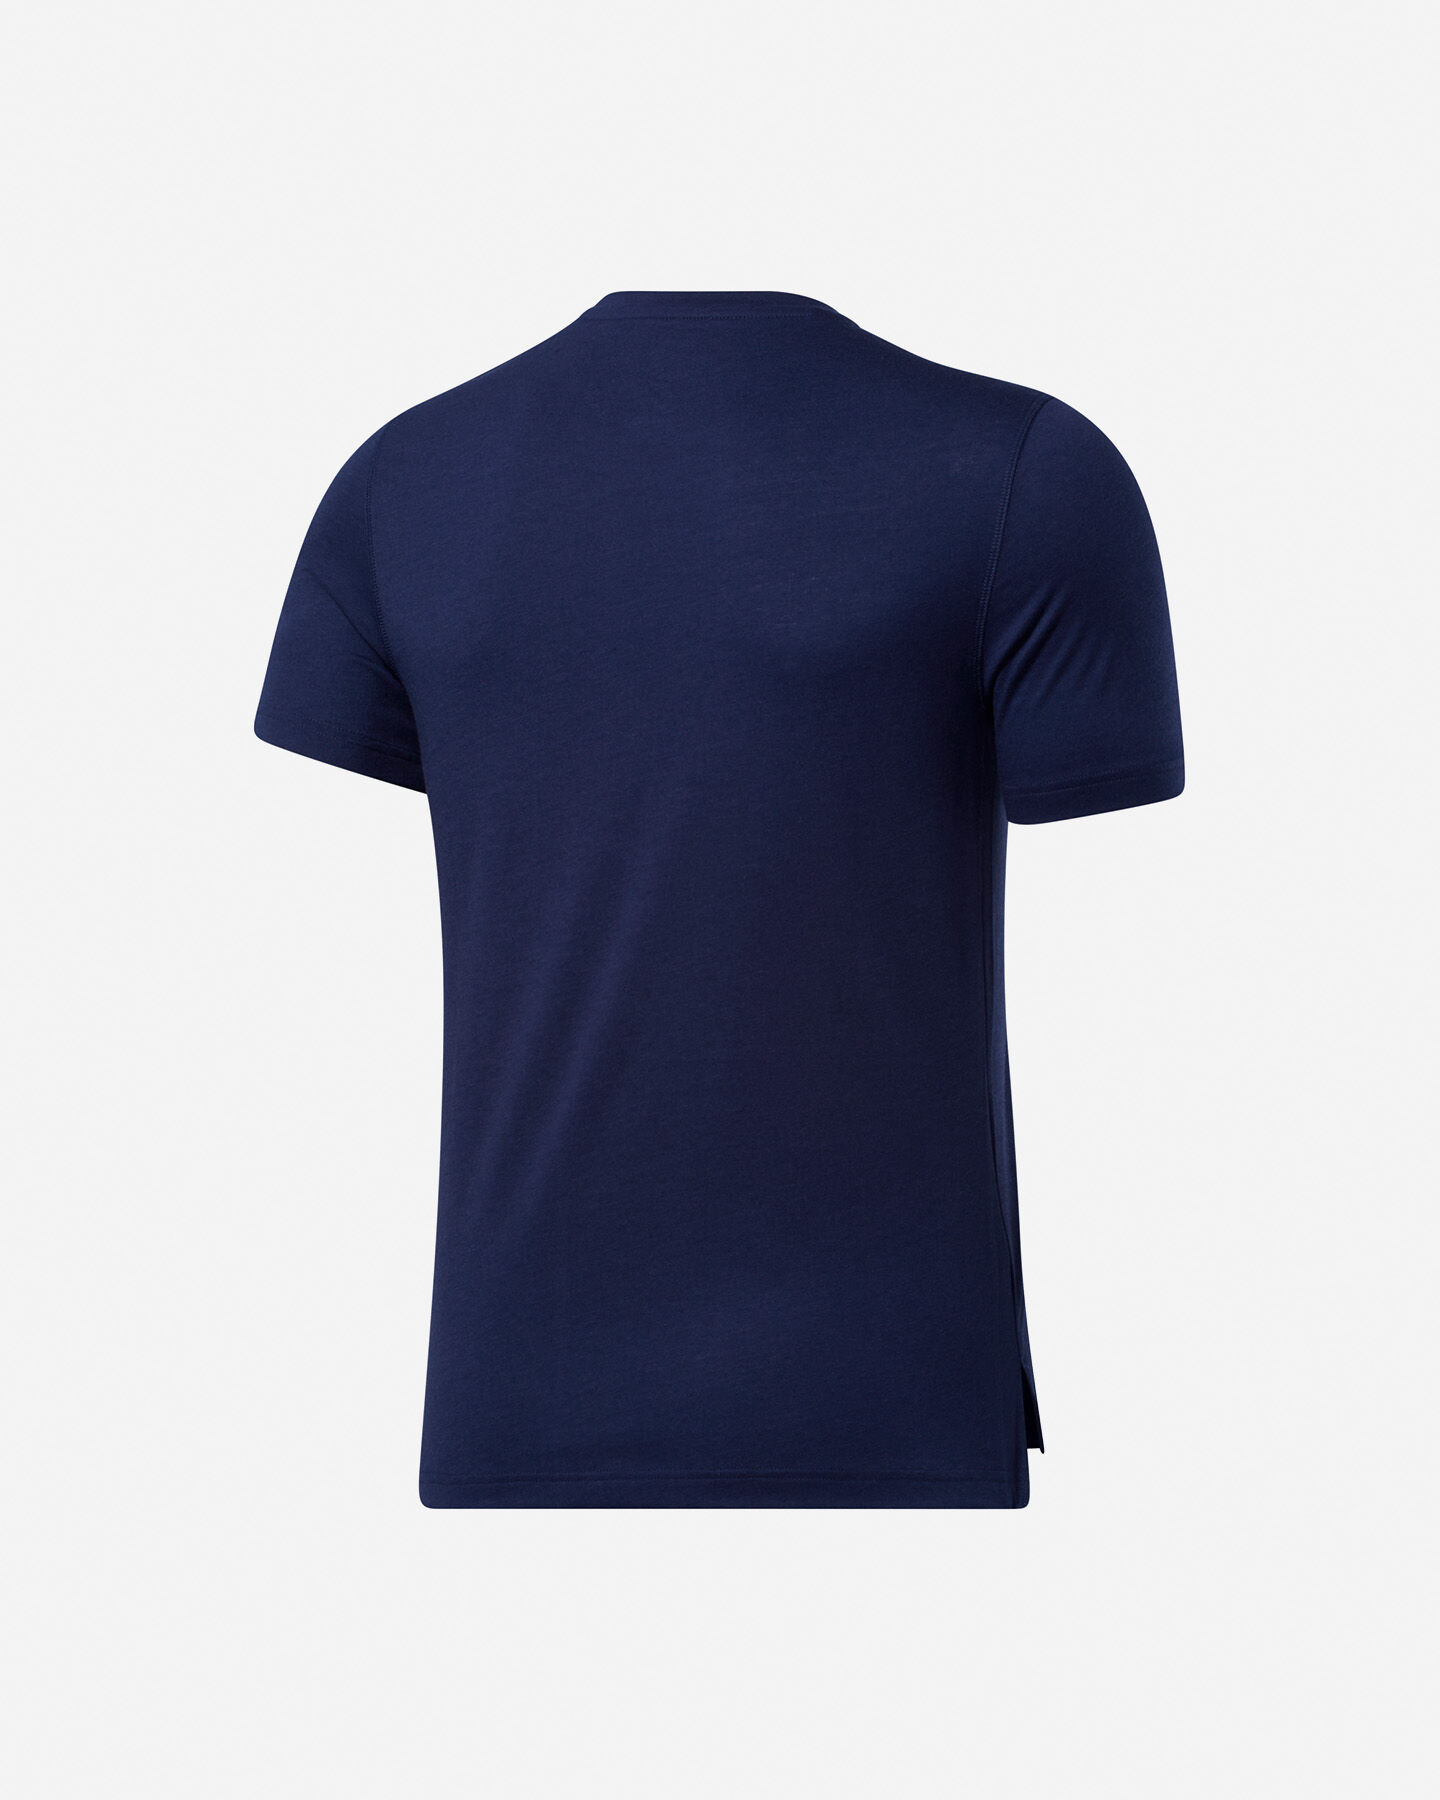 T-Shirt training REEBOK SPEEDWICK MOVE M S5280390 scatto 1